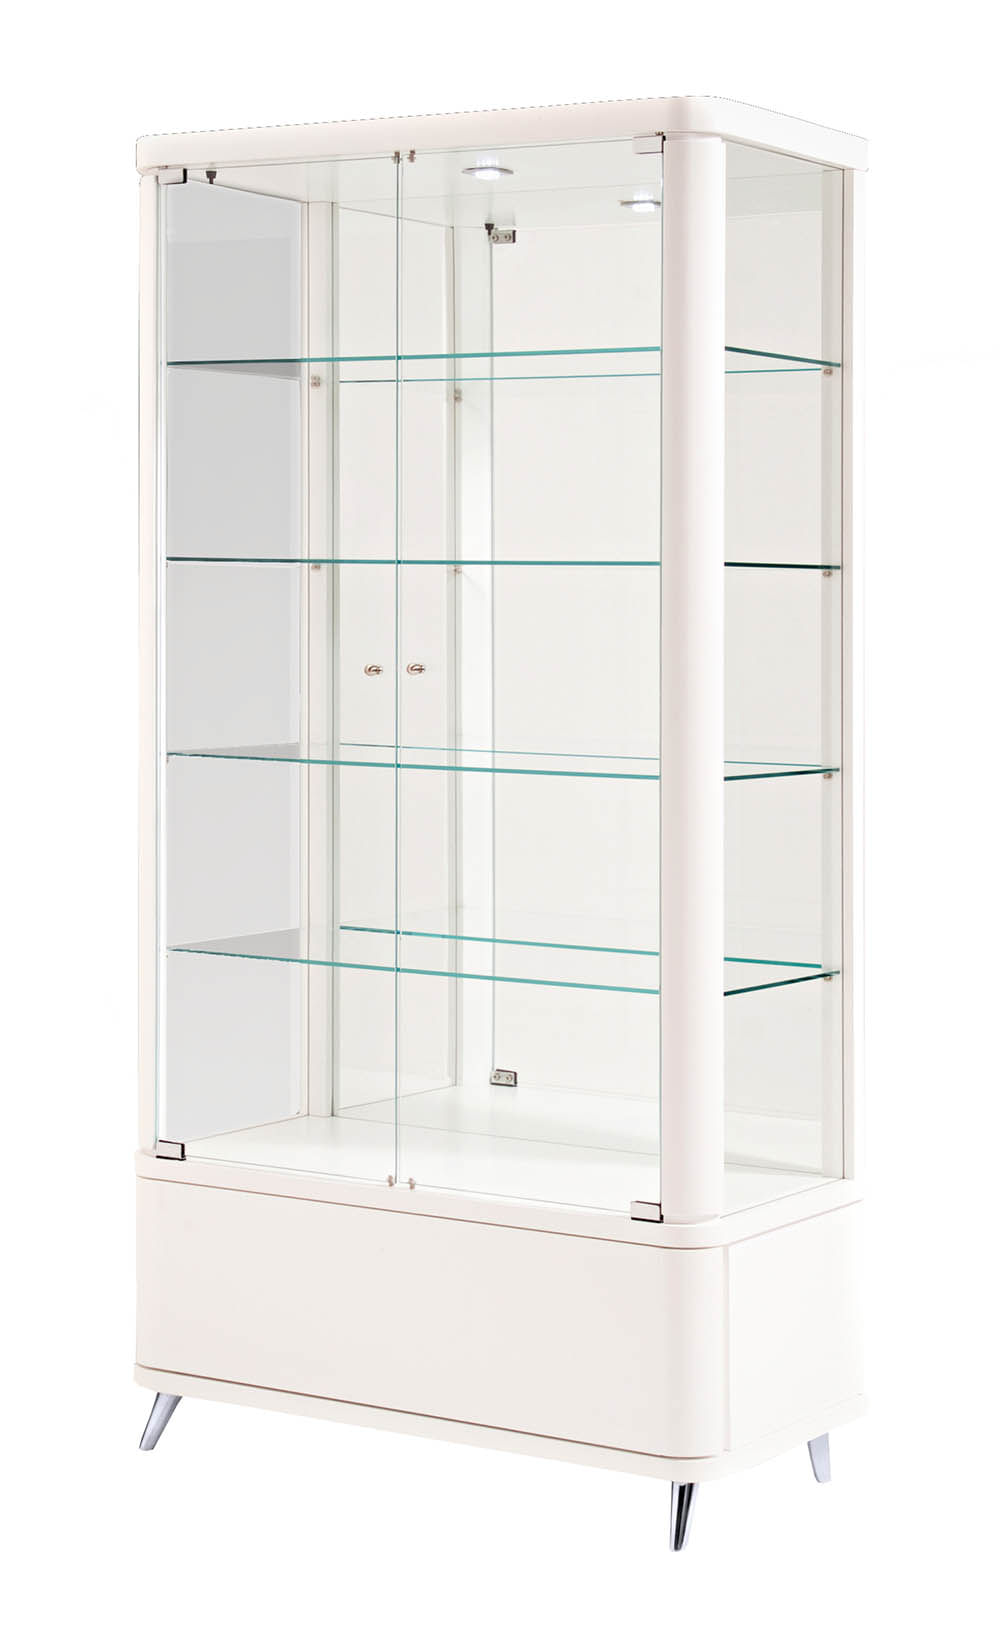 Cristaleira Olimpic Cor Laca Semi - Brilho 90 cm ( LARG ) - 37736 Sun House